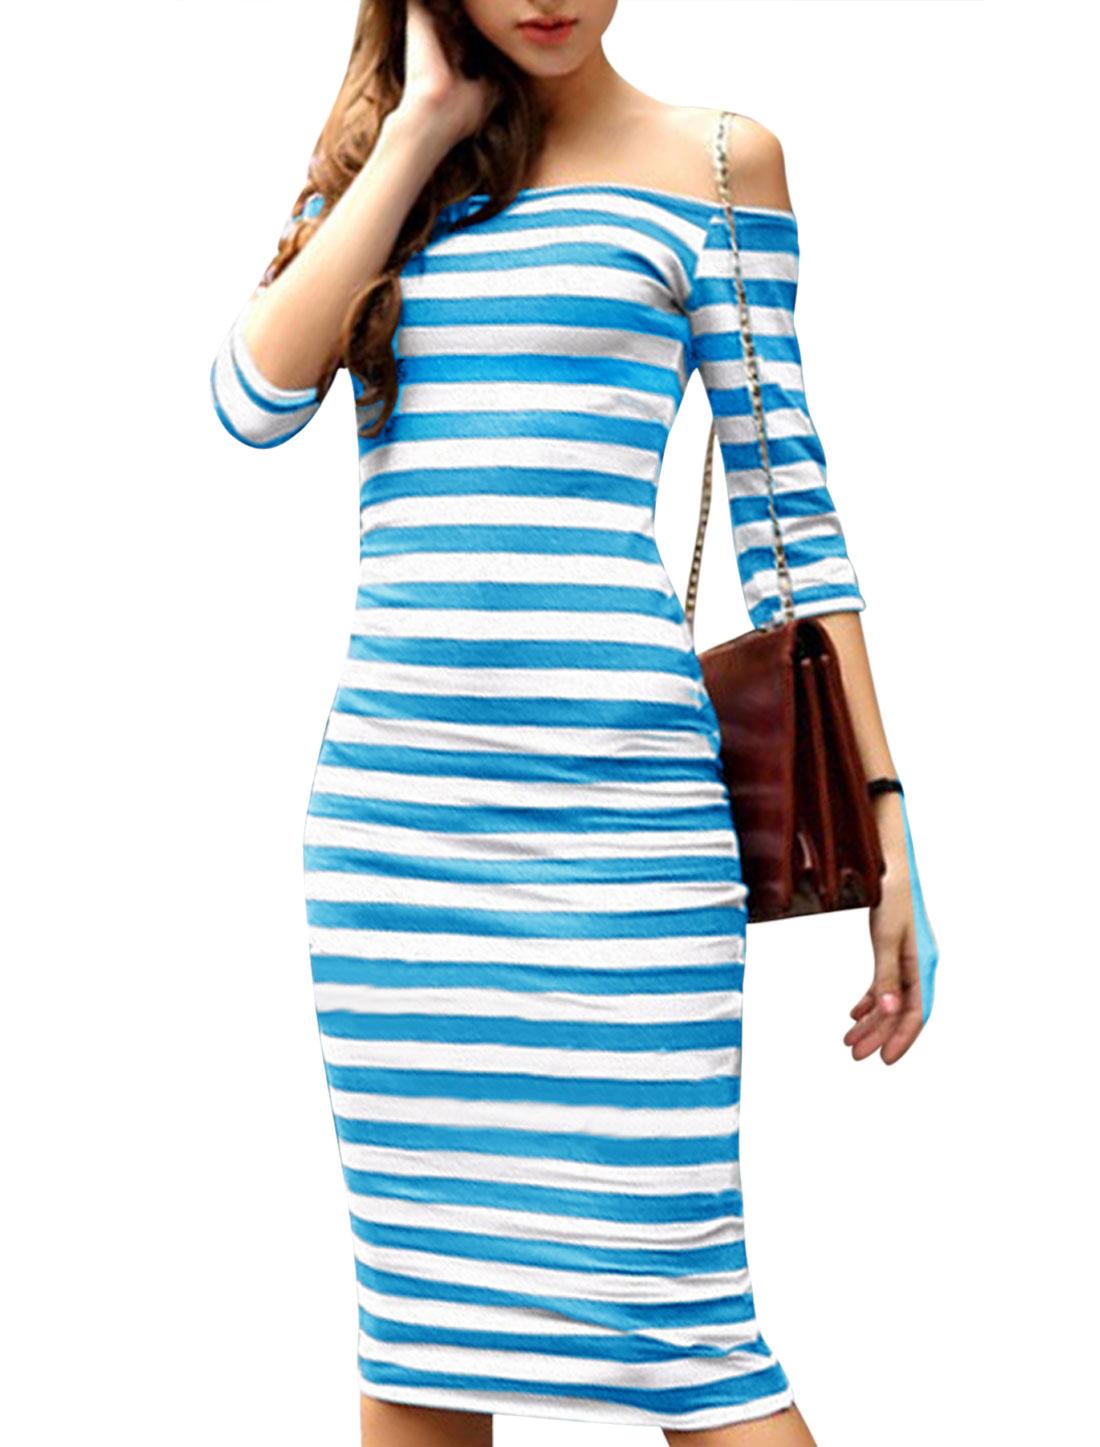 Woman Stripes Off Shoulder 3/4 Sleeves Bodycon Sheath Dress Light Blue White M